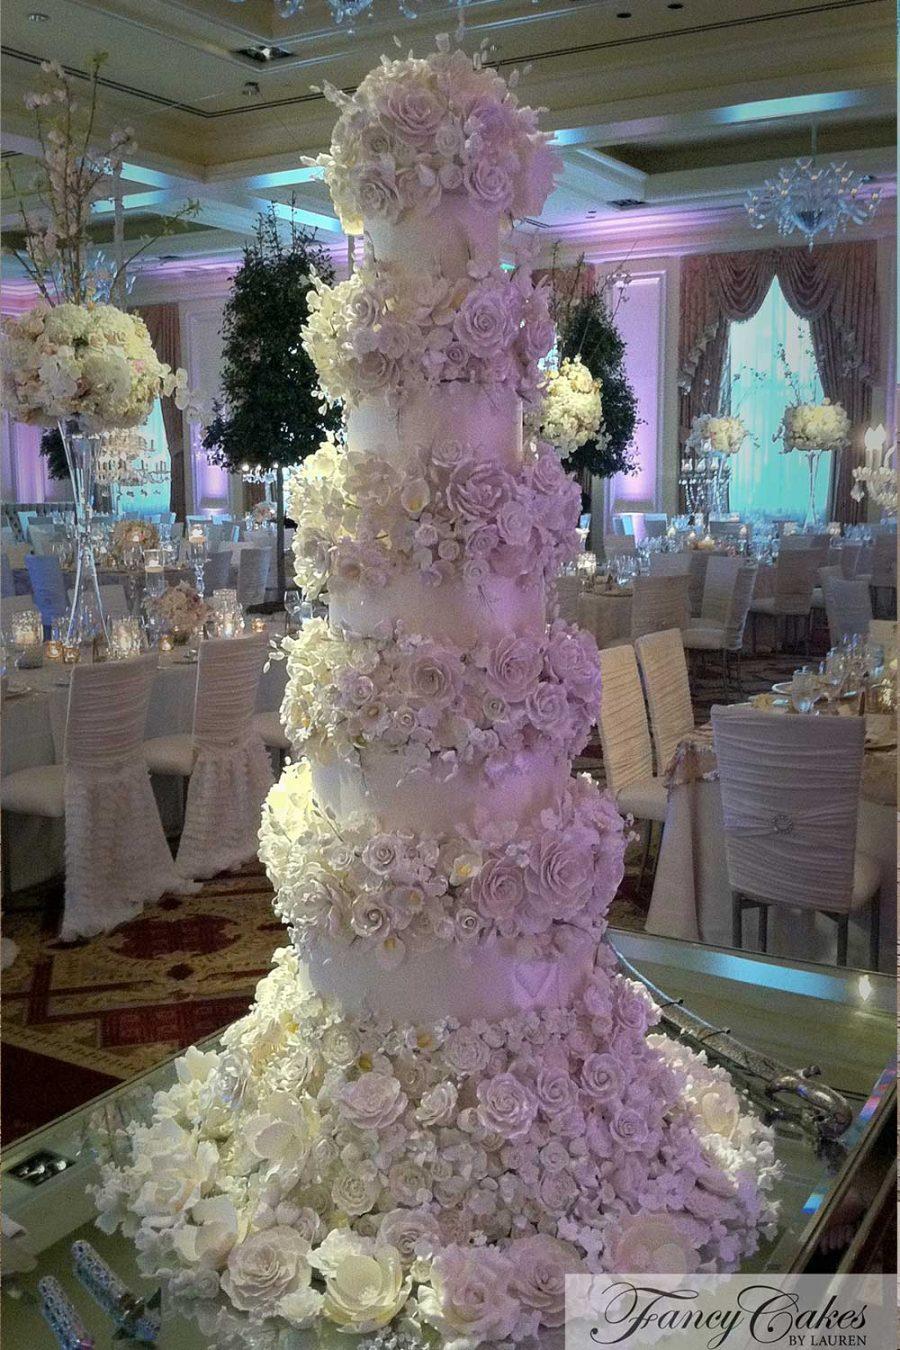 wedding cakes fancy cakes by lauren kitchens. Black Bedroom Furniture Sets. Home Design Ideas